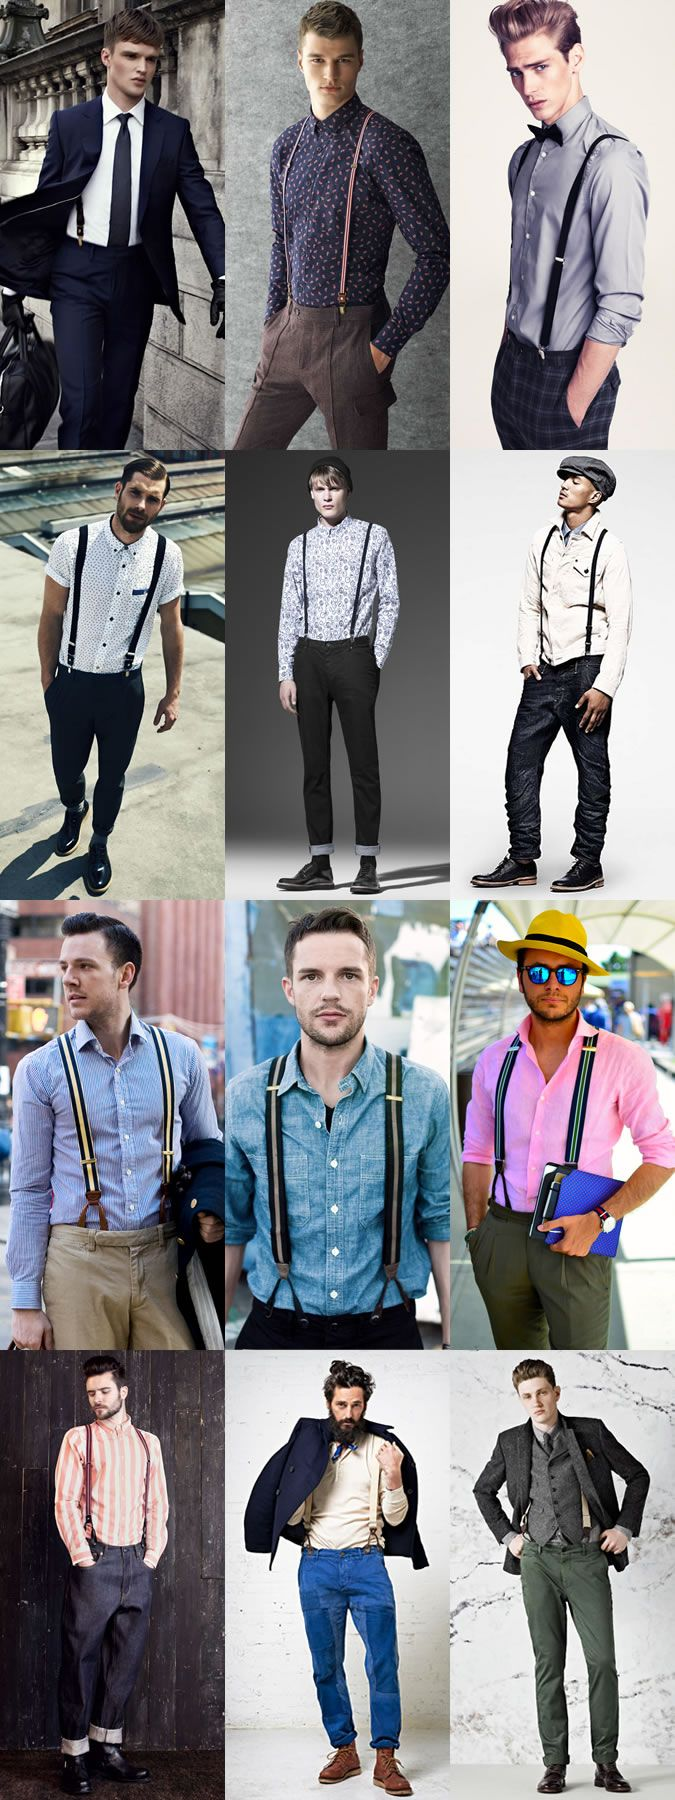 Men's Belts Guide: Braces Lookbook Inspiration